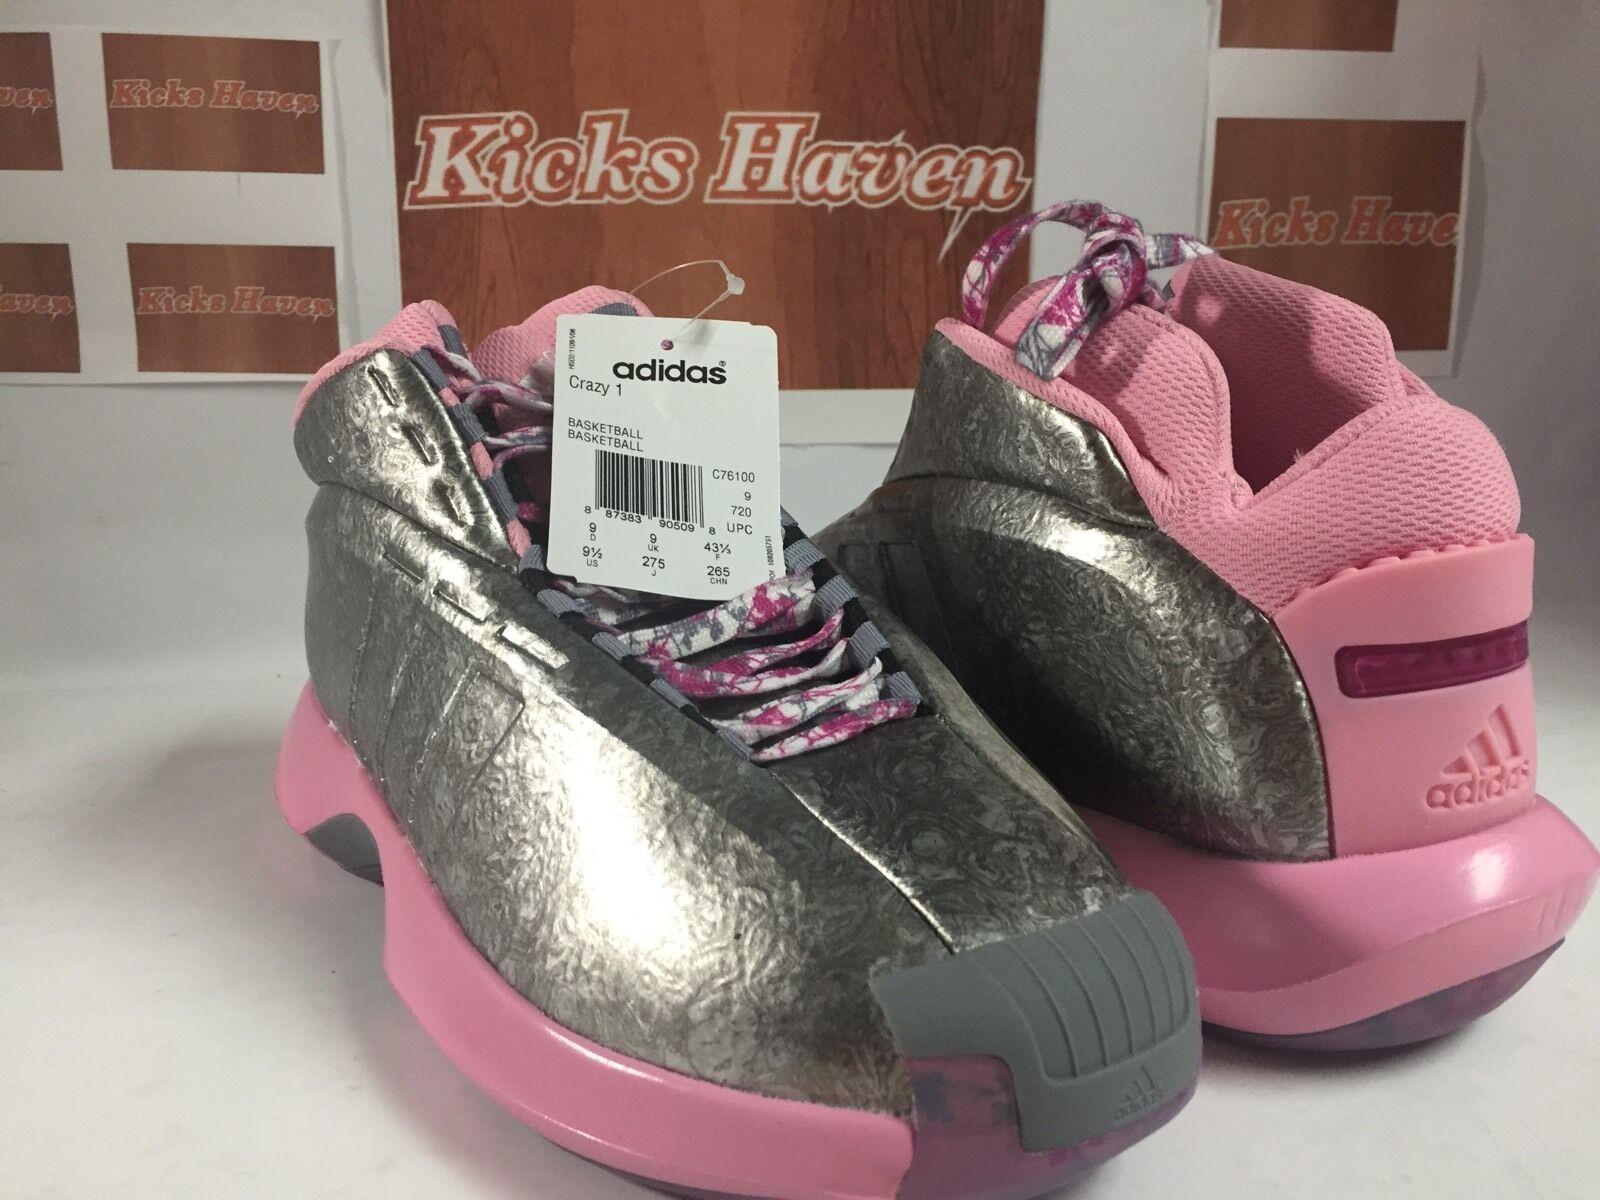 neue adidas verrückt 1 john wall pe floristen kobe stadt rosa band schuh kobe floristen c76100 sz 8,5 dce07b